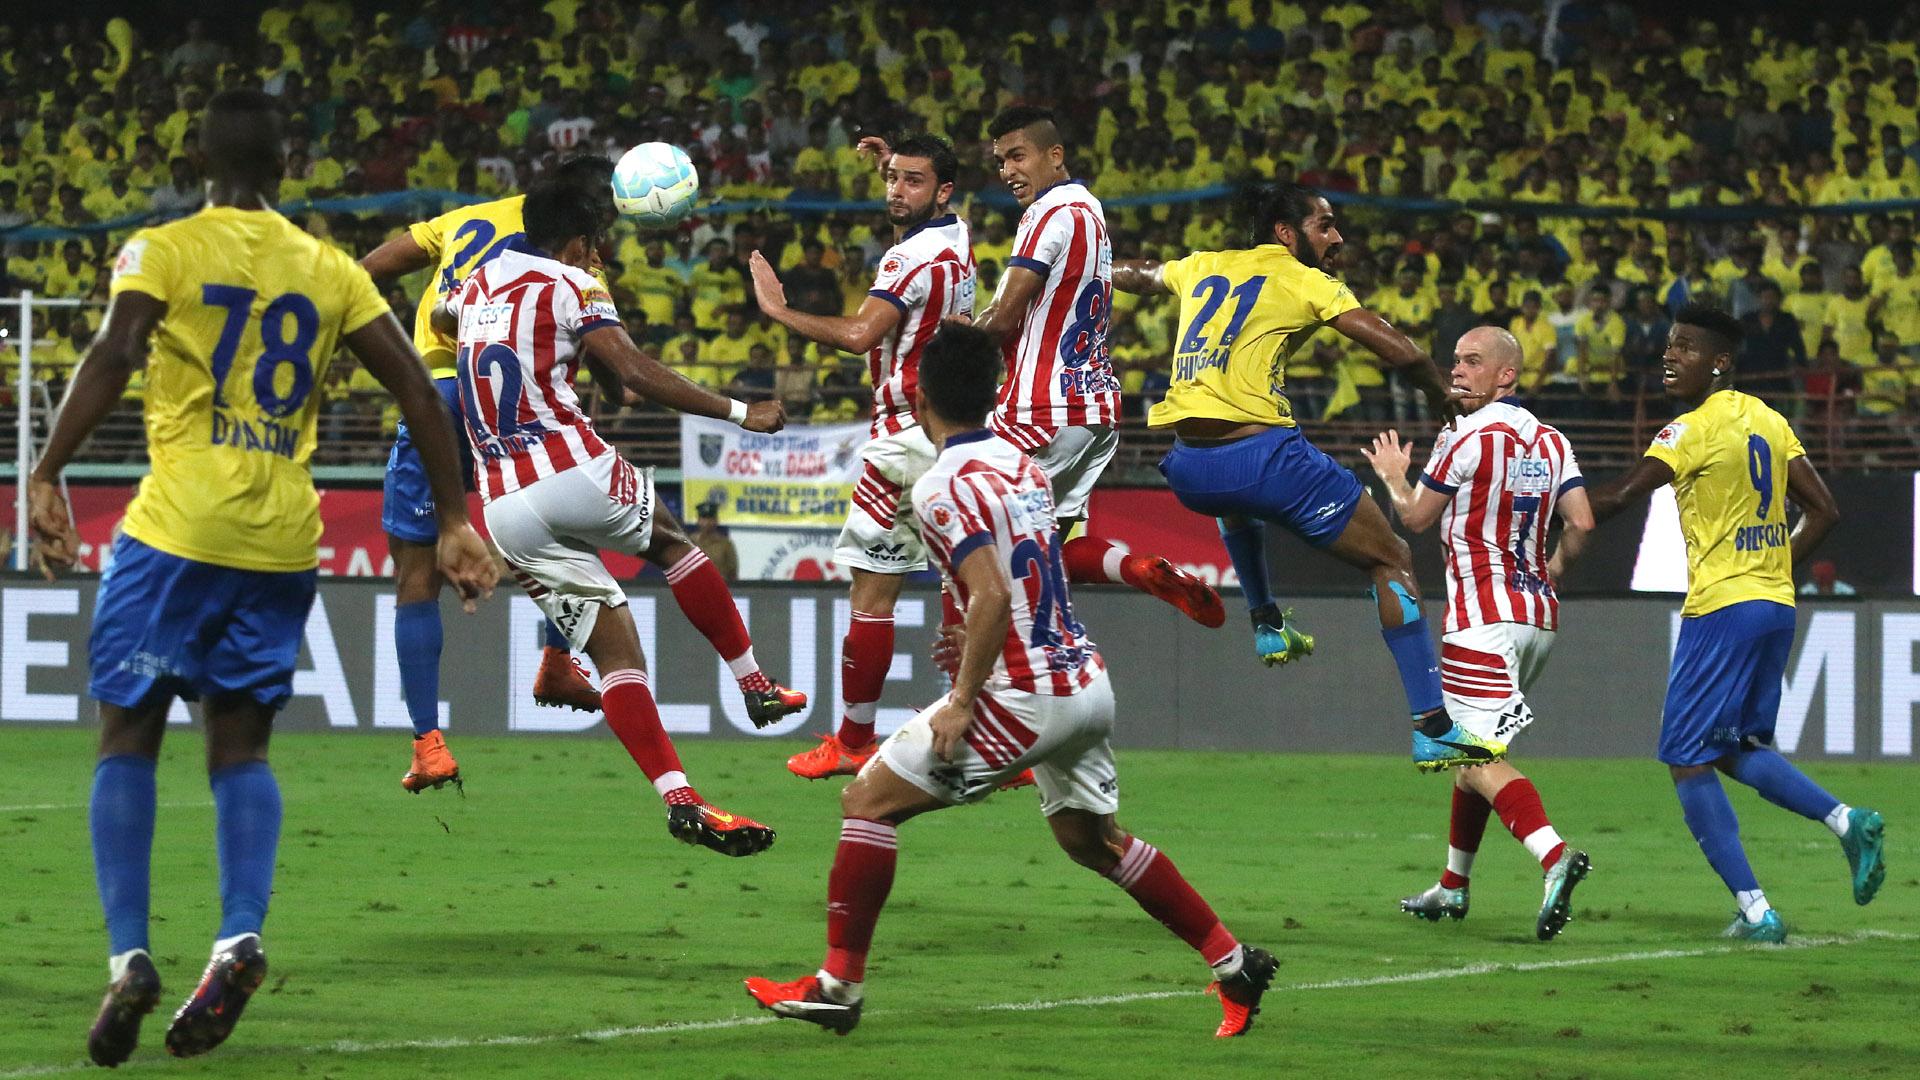 ISL 2017: ATK vs Kerala Blasters opening game shifted to Kochi, Kolkata to host finals